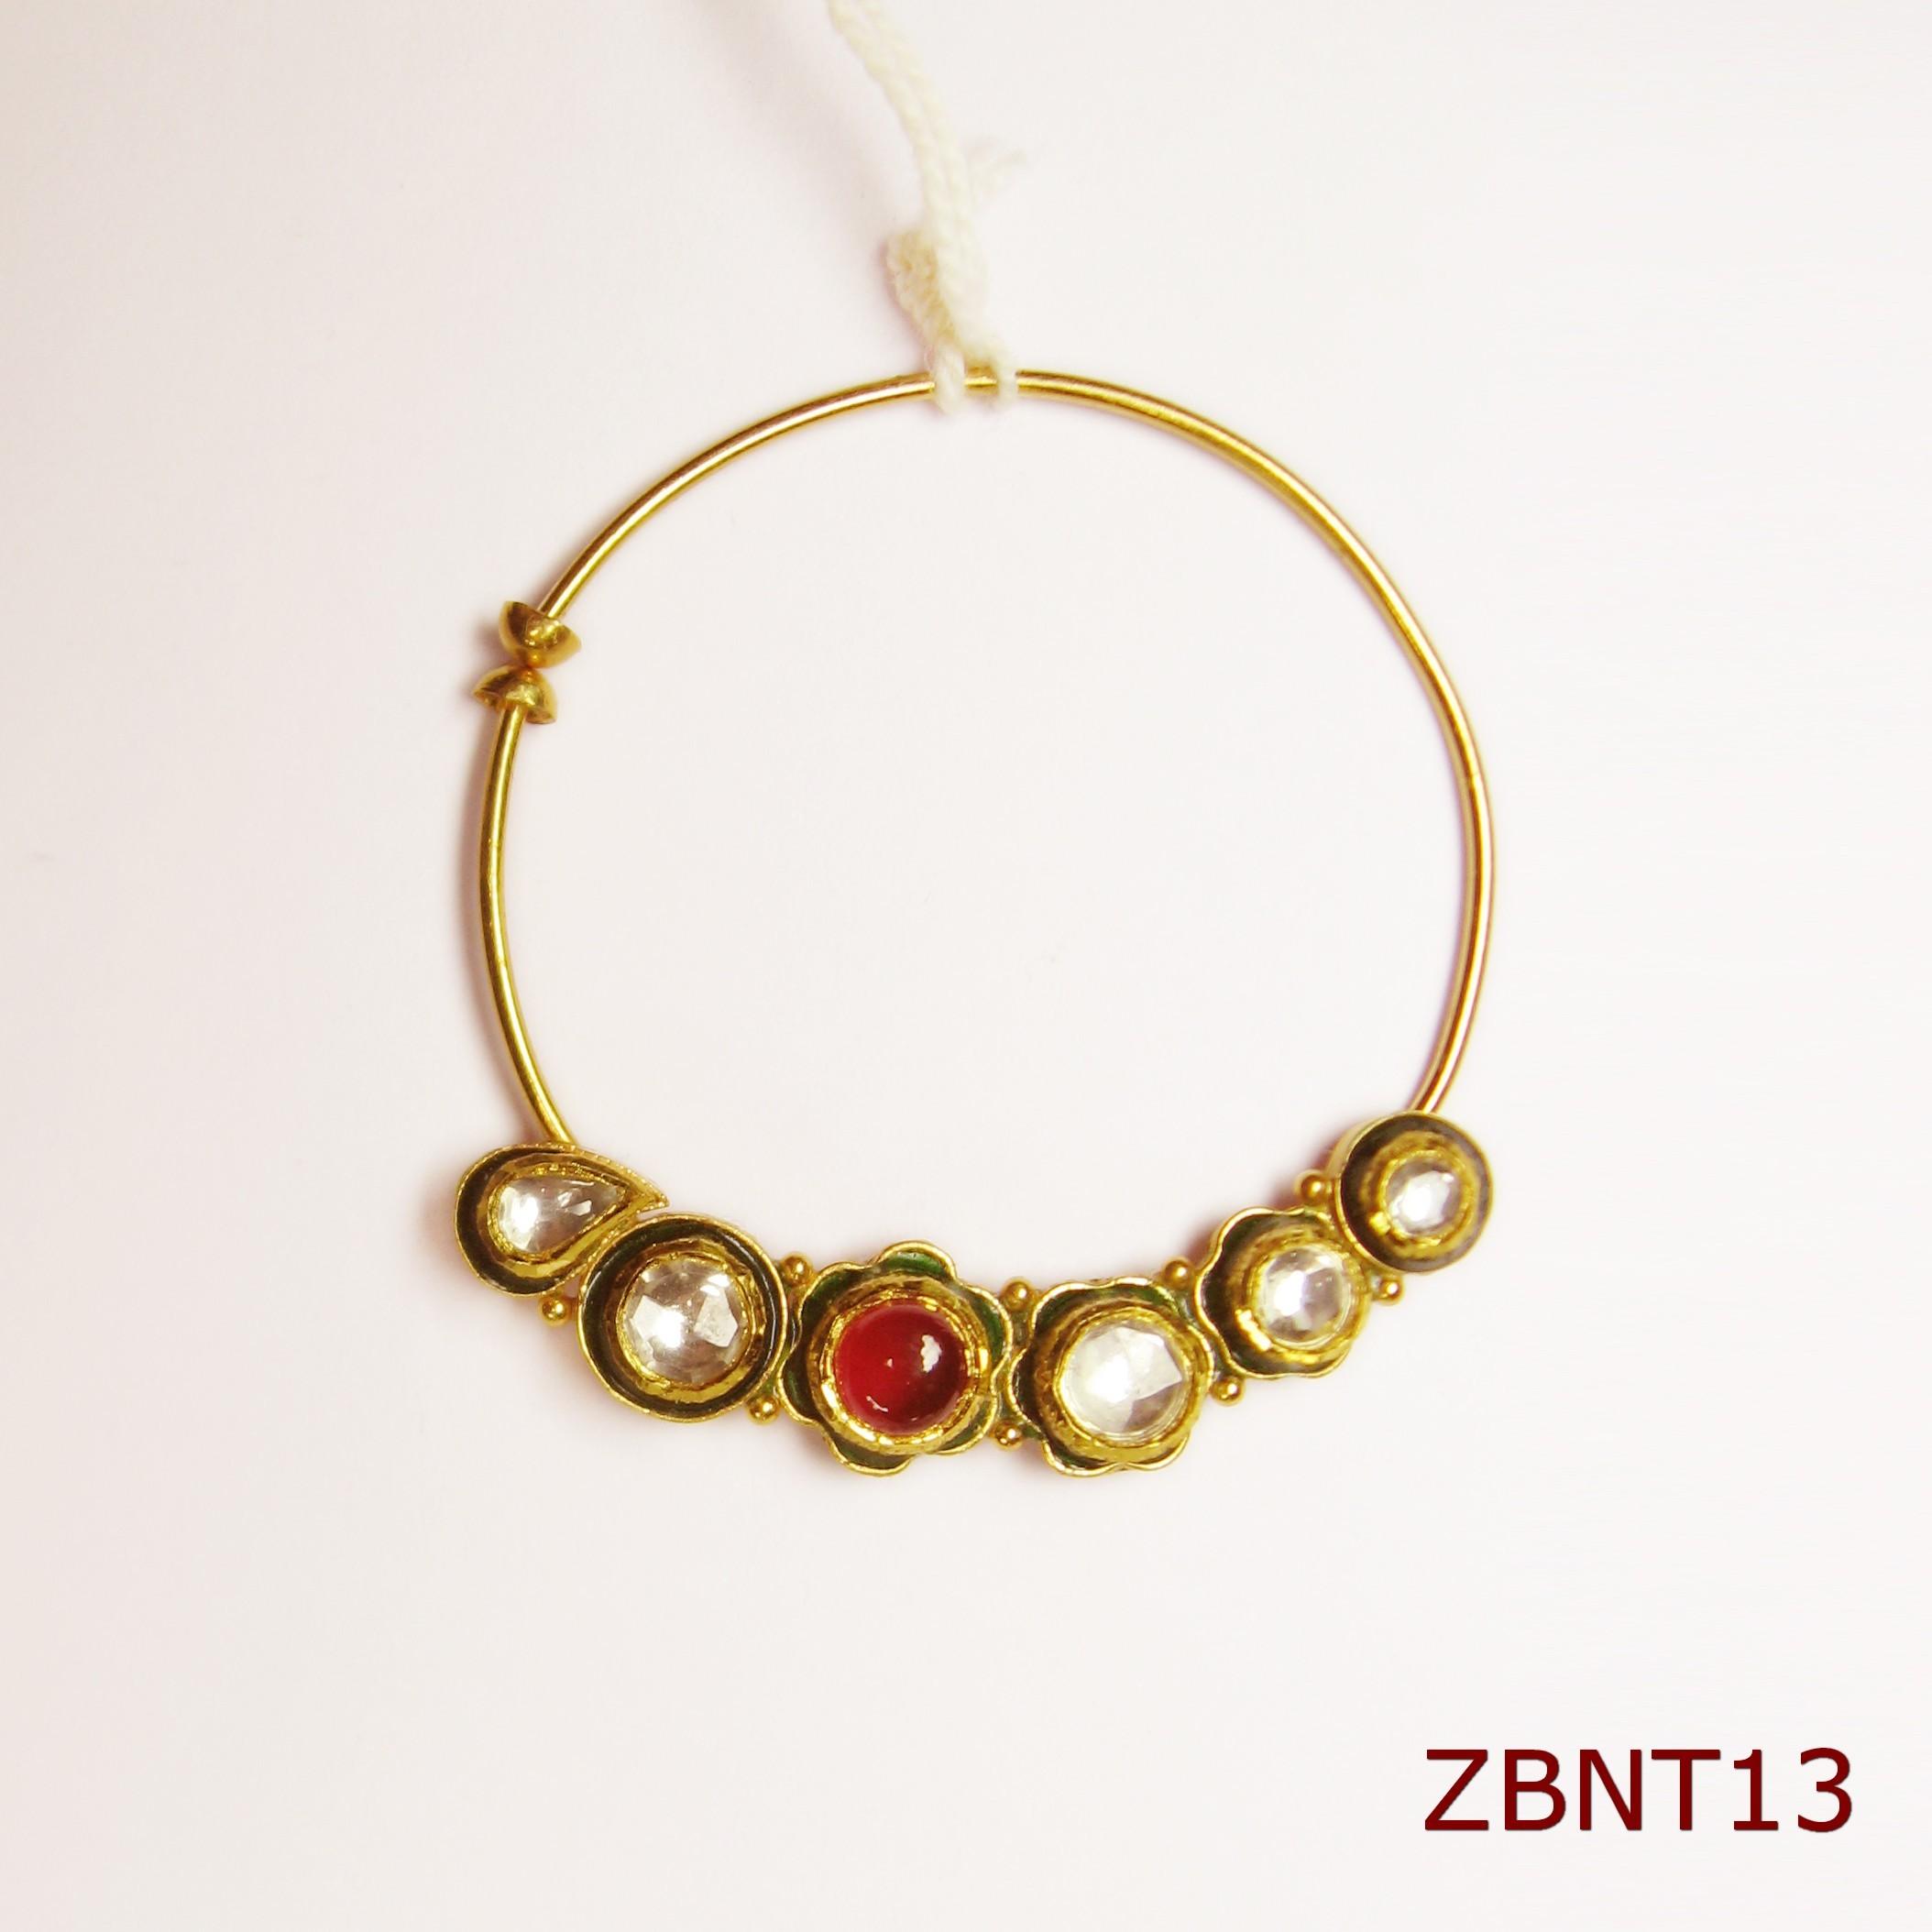 ZBNT13